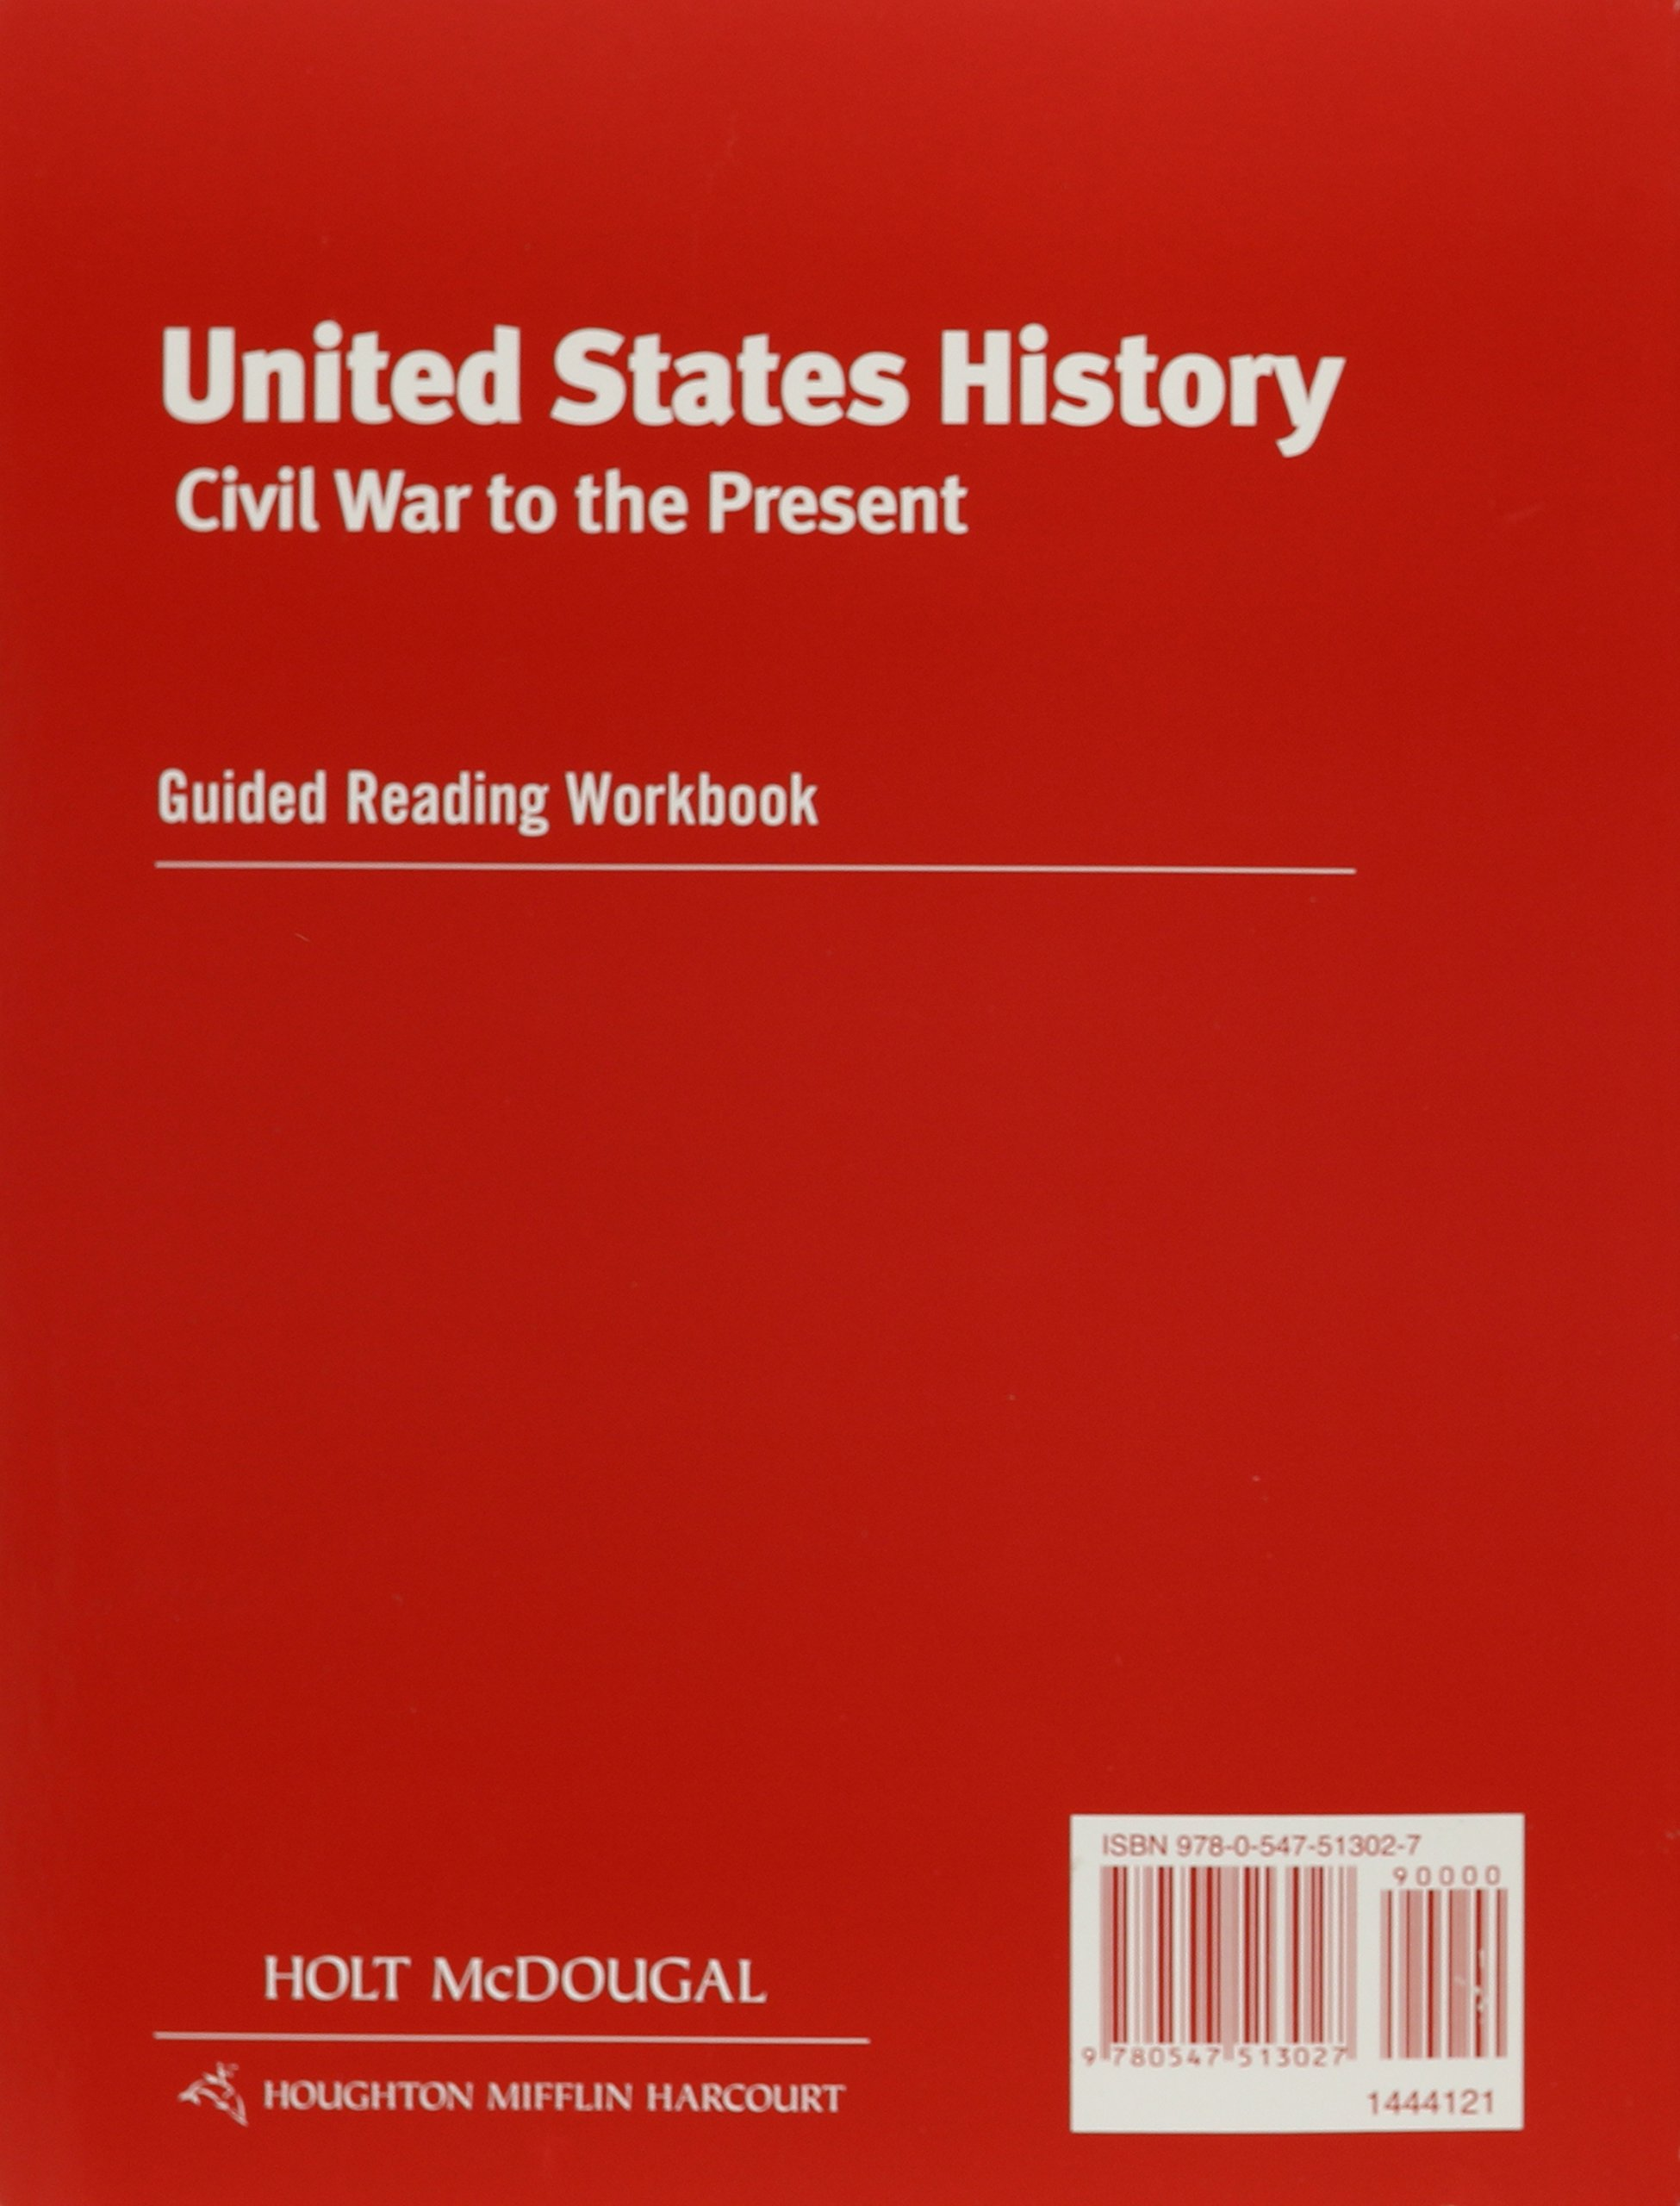 amazon com united states history guided reading workbook civil war rh amazon com american history guided reading workbook us history guided reading workbook answers